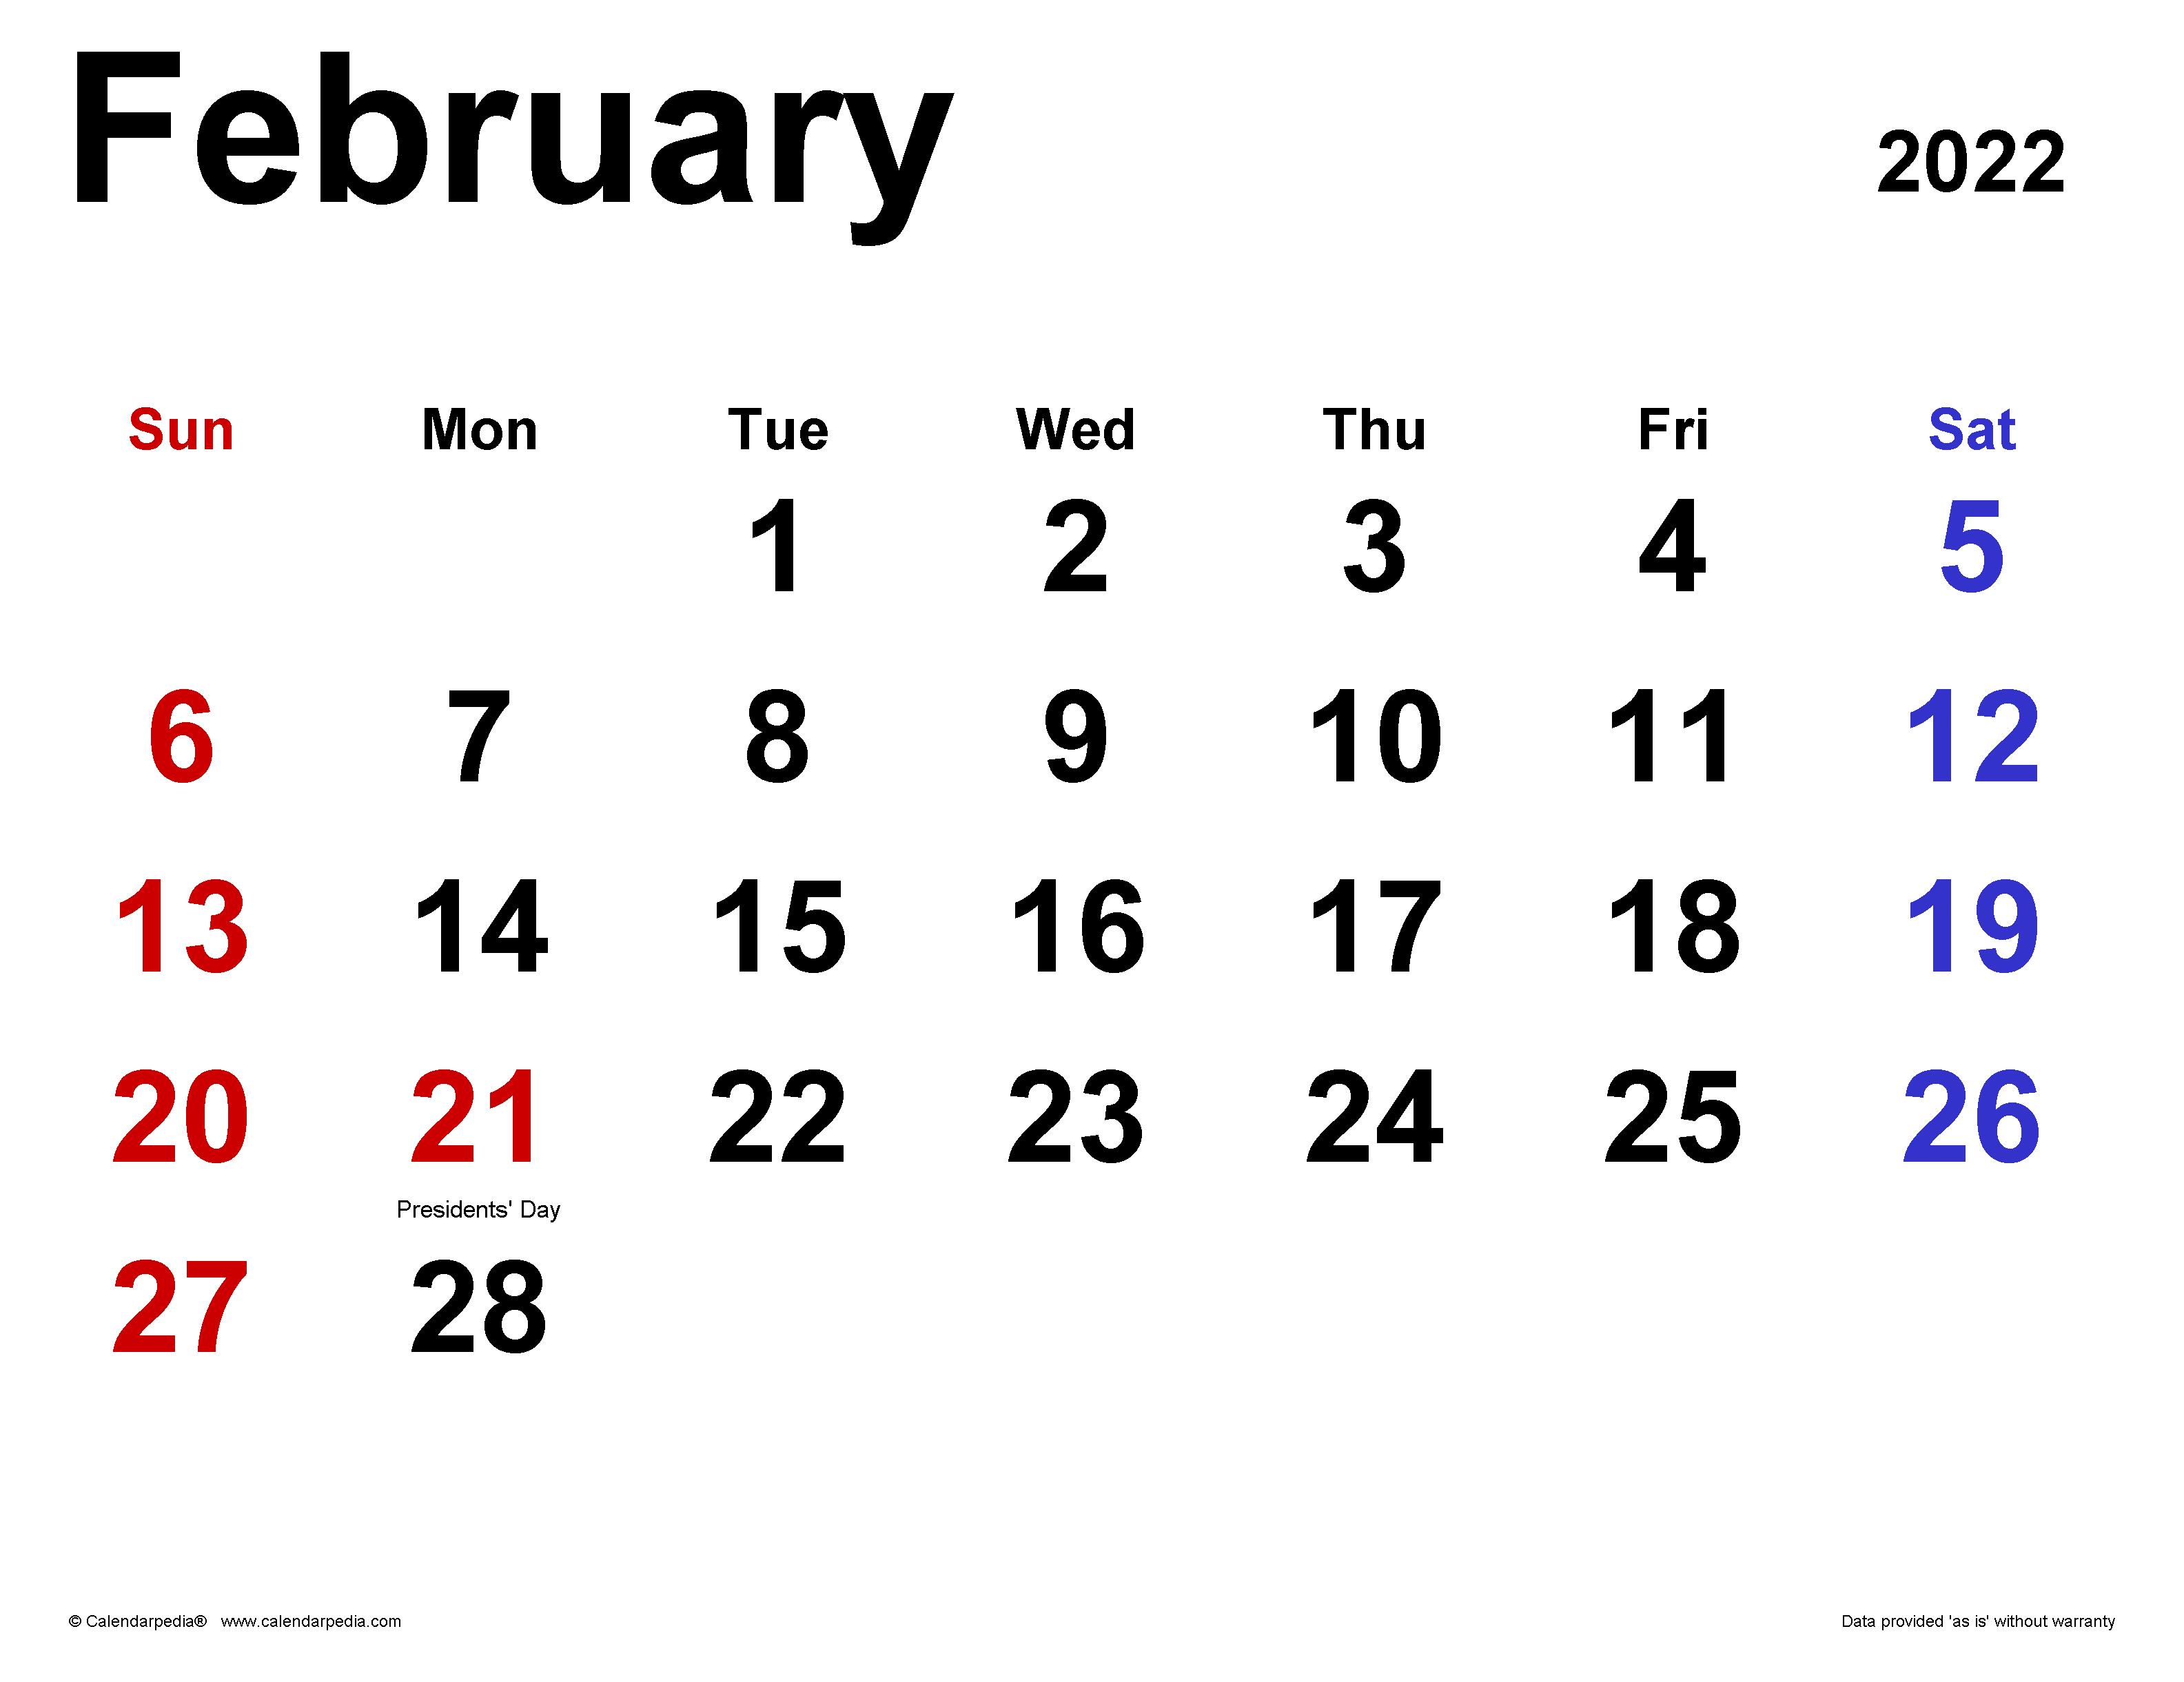 February 2022 Calendar Wallpaper.February 2022 Calendar Templates For Word Excel And Pdf